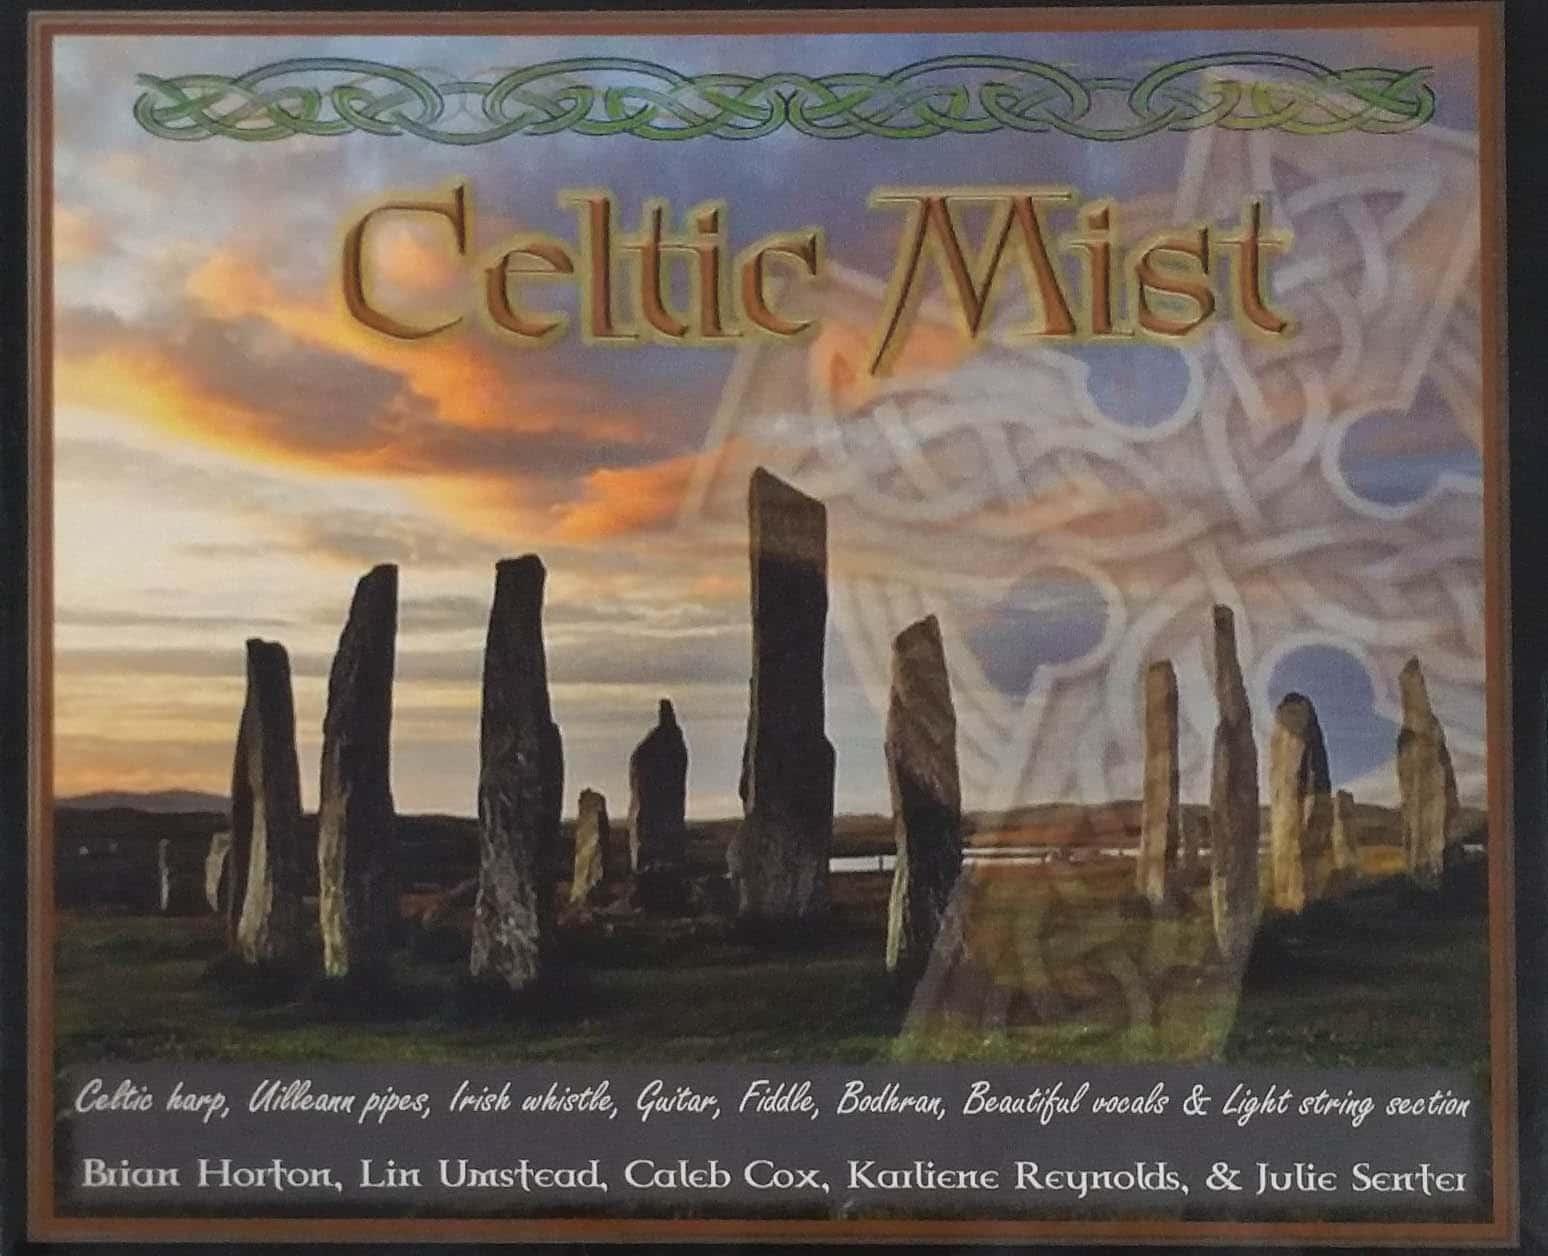 MCDCM1 Celtic Mist CD